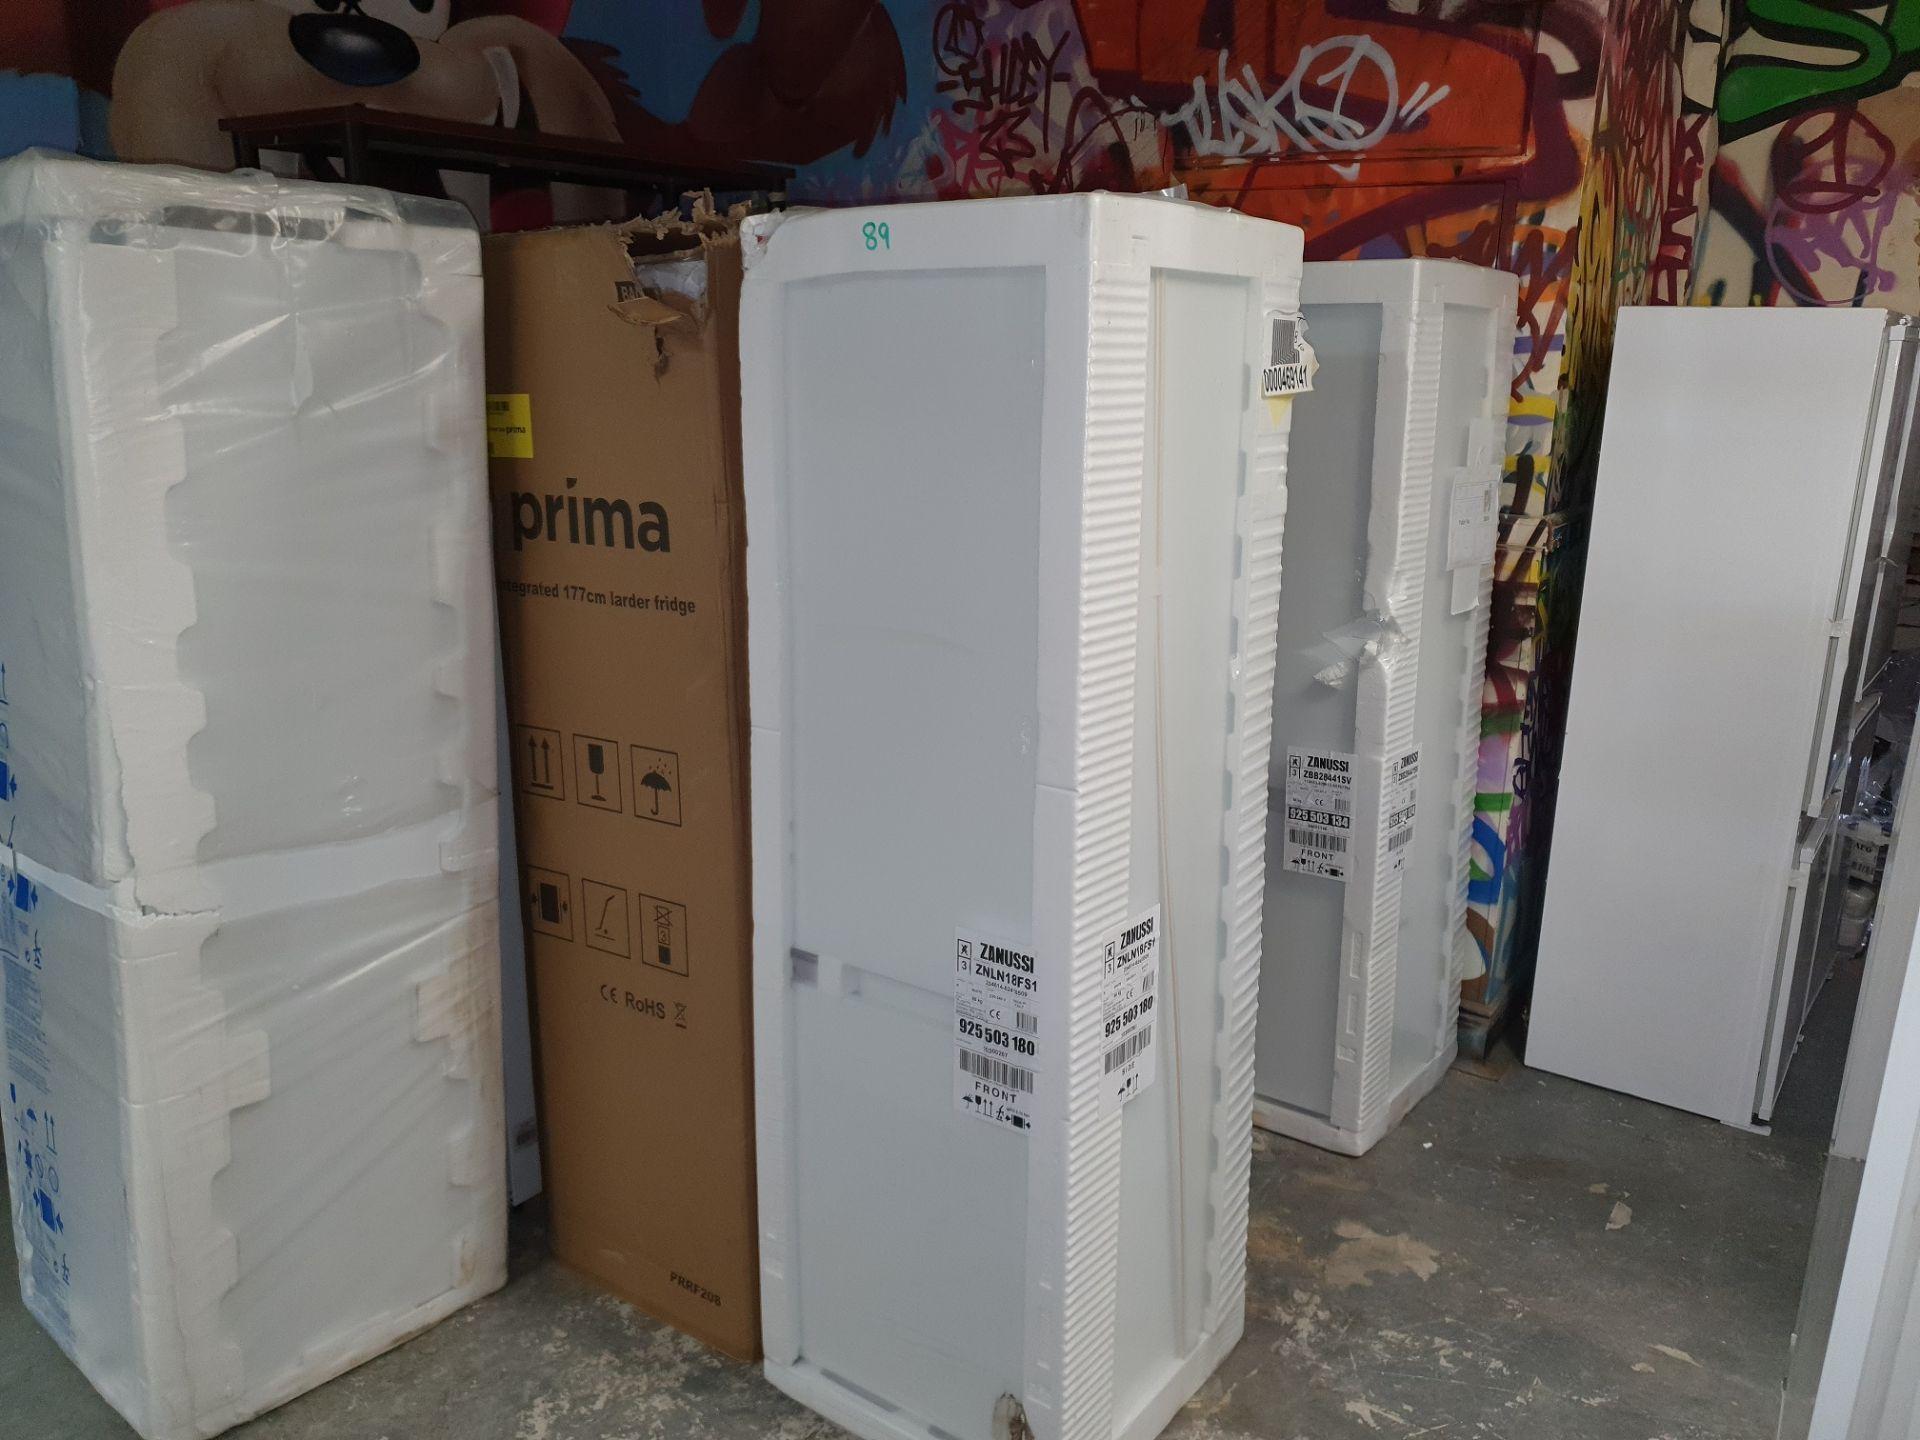 NEW/GRADED AND PACKAGED Zanussi ZBB28441SV Integrated 70/30 Fridge Freezer (Slight external damage) - Image 3 of 14